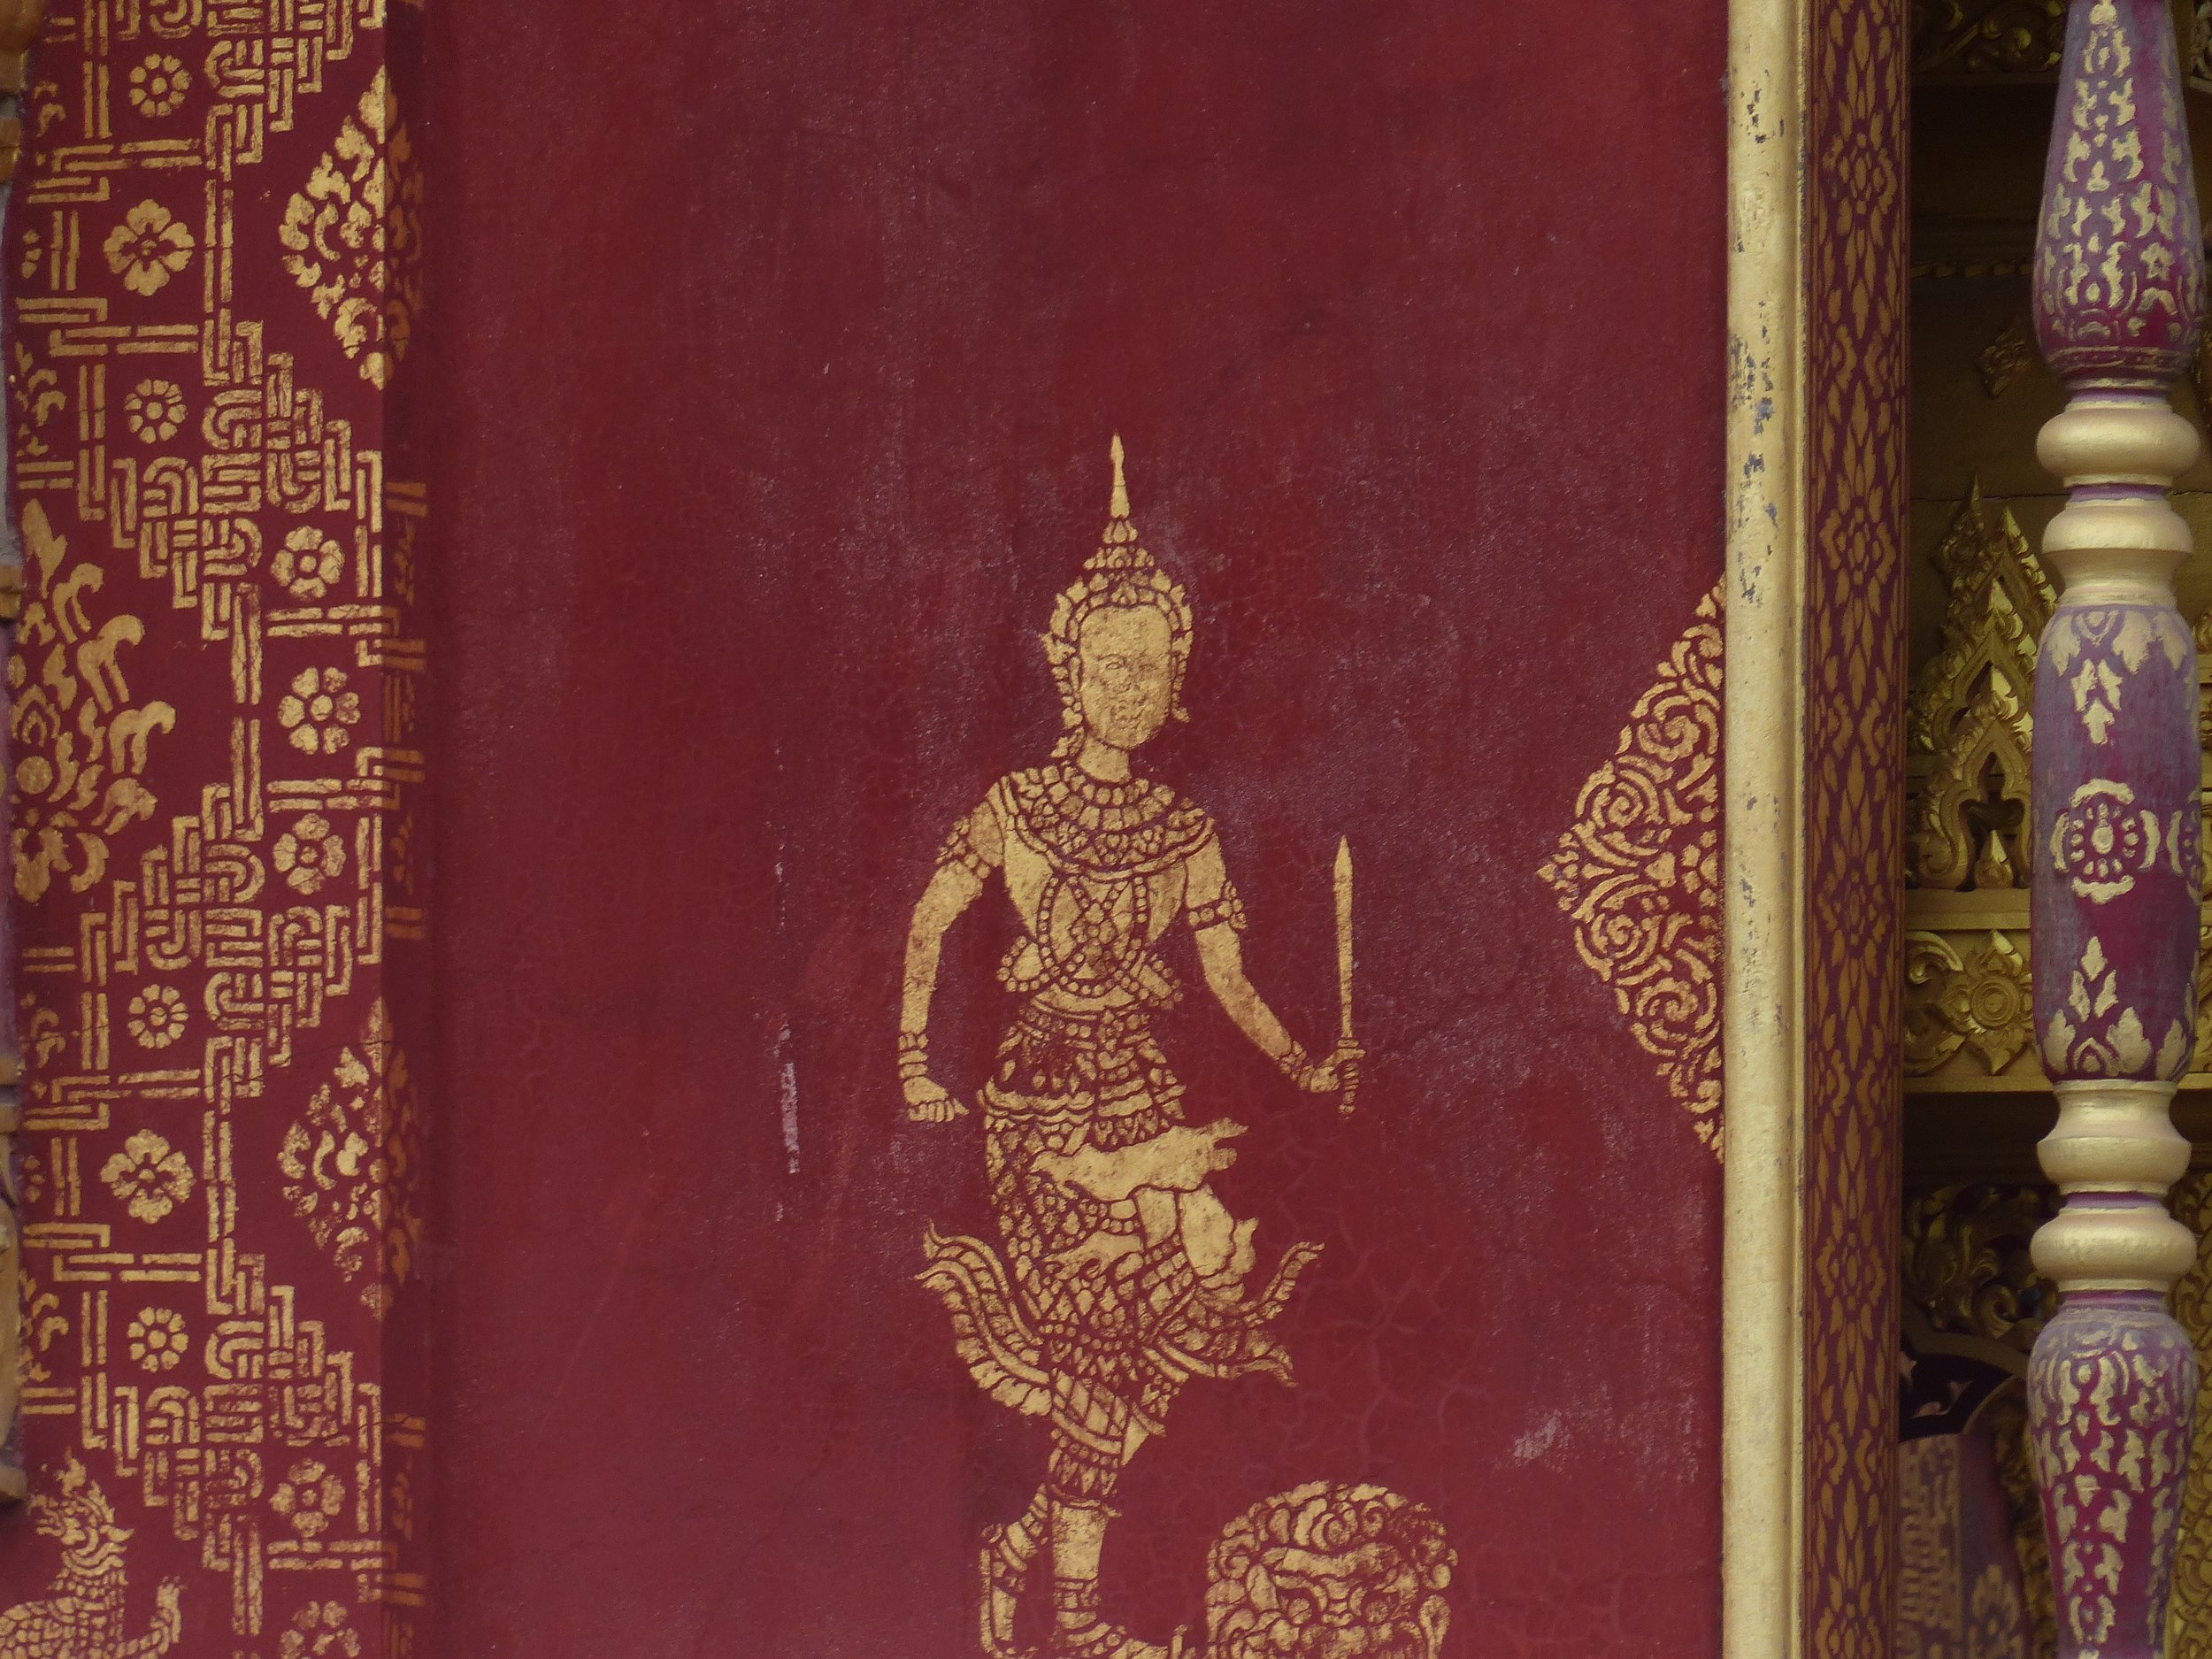 Lao art/storytelling